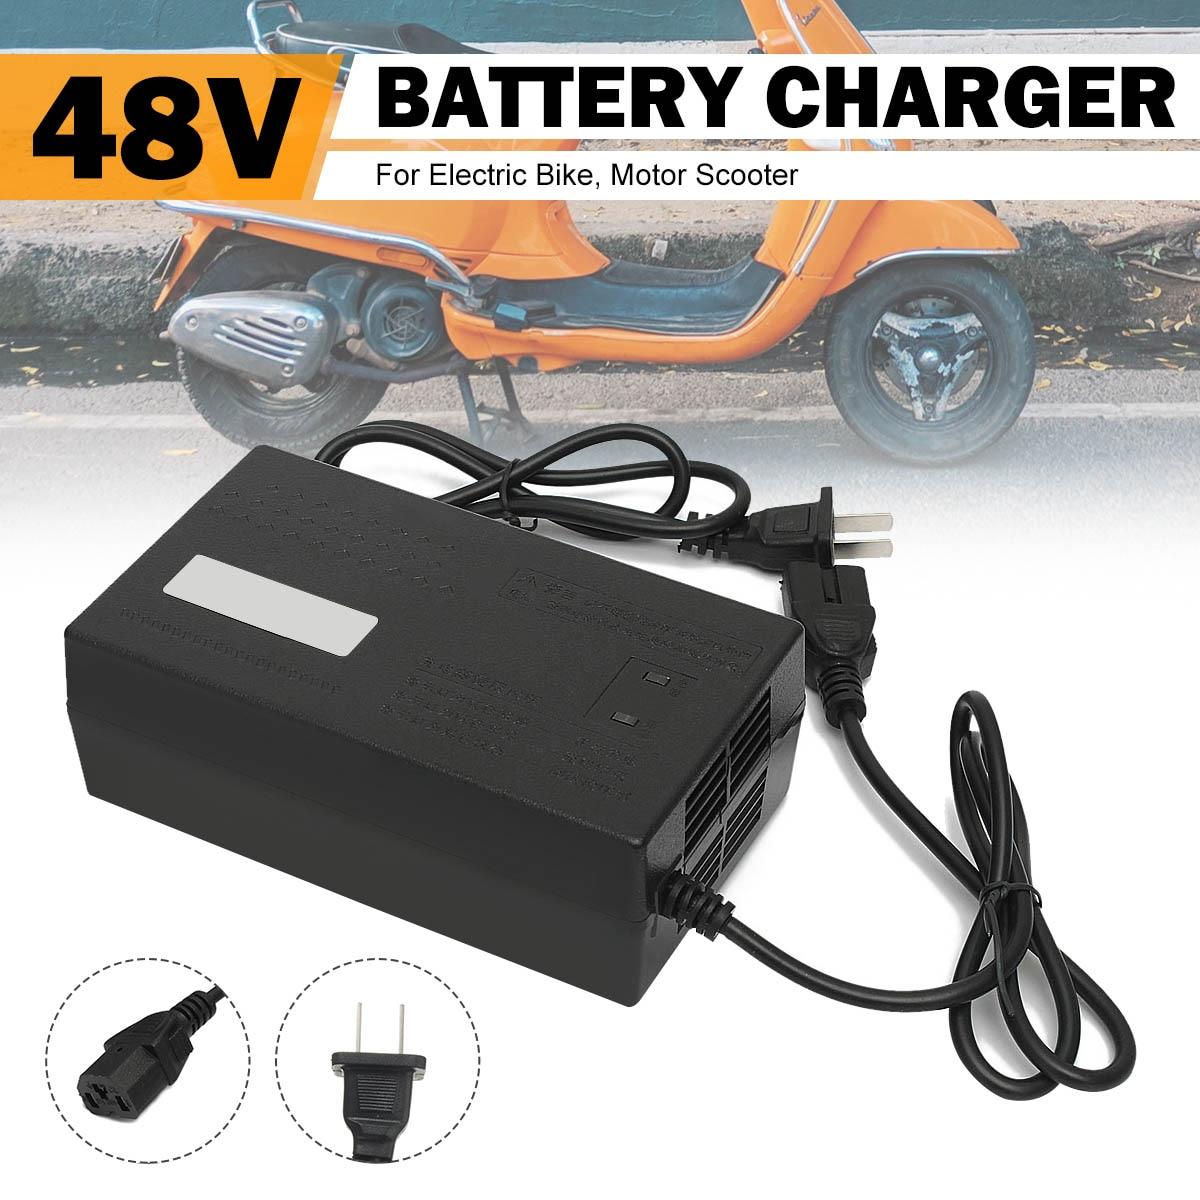 LEORY 48V12-14AH Lead Electric Bicycle Bike Acid Battery Charger For Electrocar Scooters EU Plug 48V 14AH LED Indicator Light